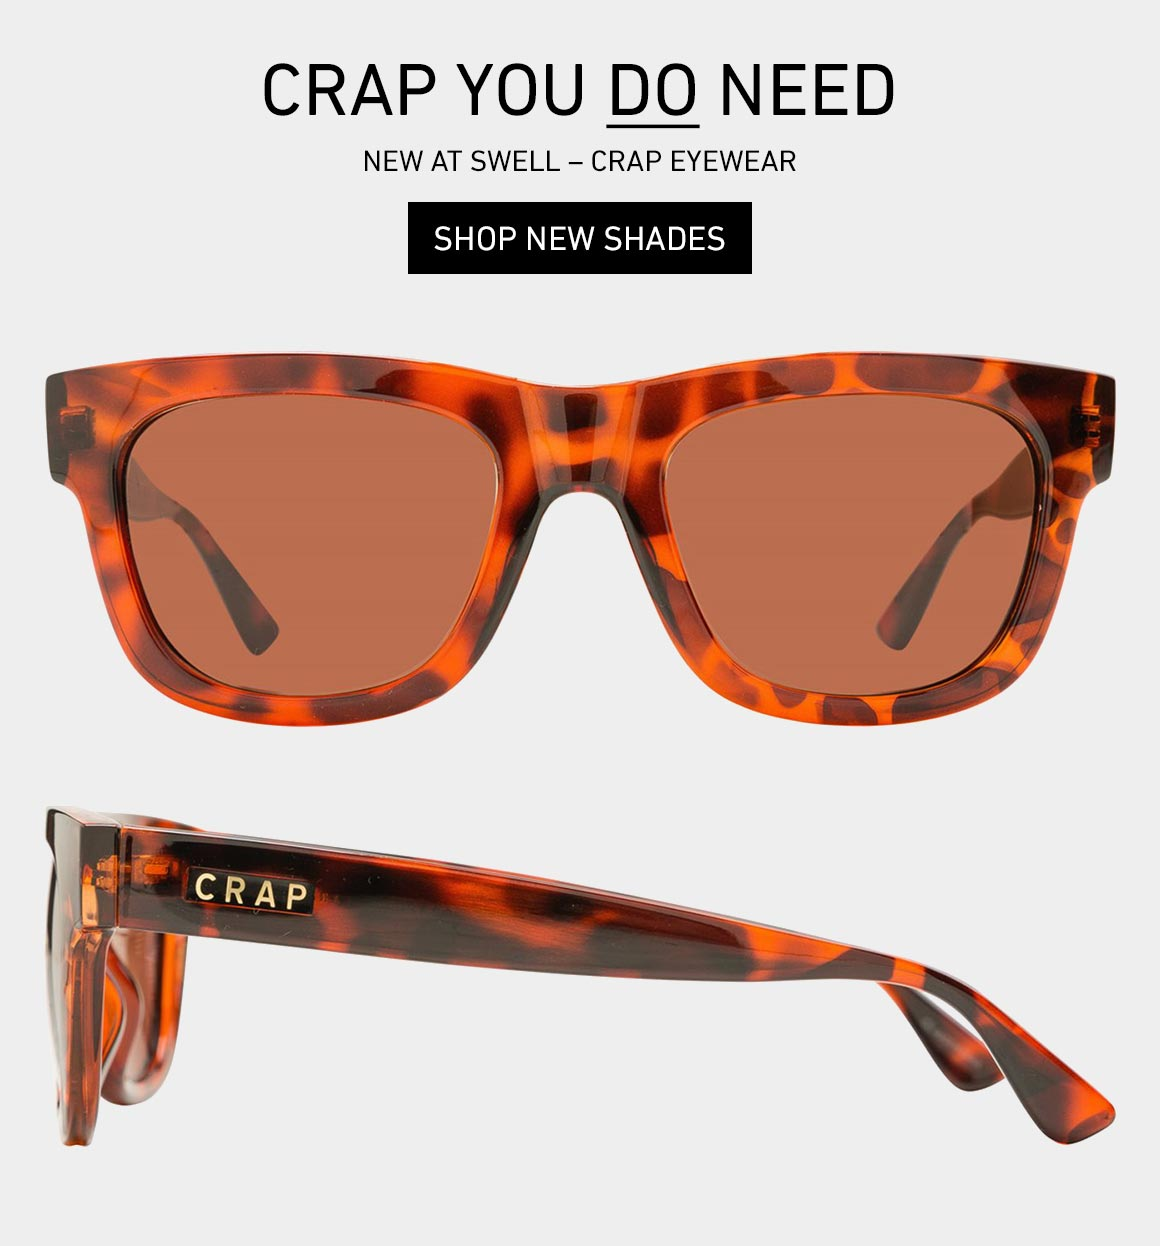 Crap You DO Need: Shop Crap Eyewear